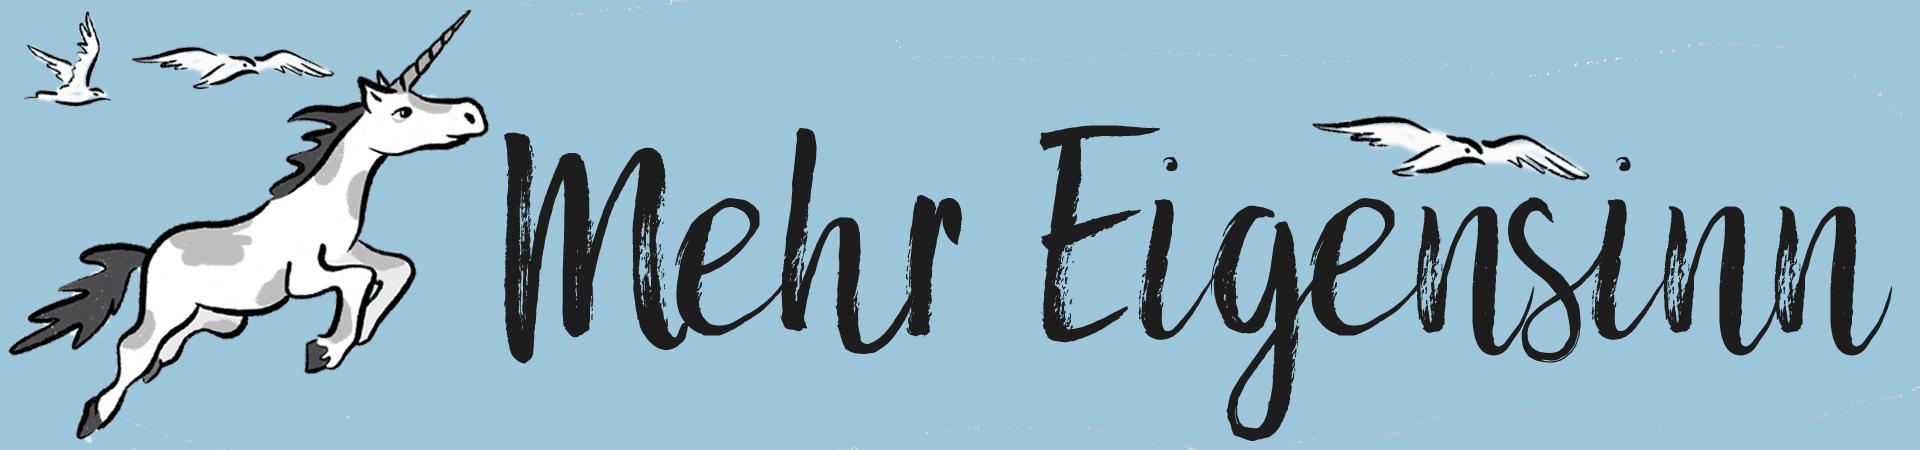 Verlag Texthandwerk: Professionelles Lektorat, Selfpublishing, Autorenberatung